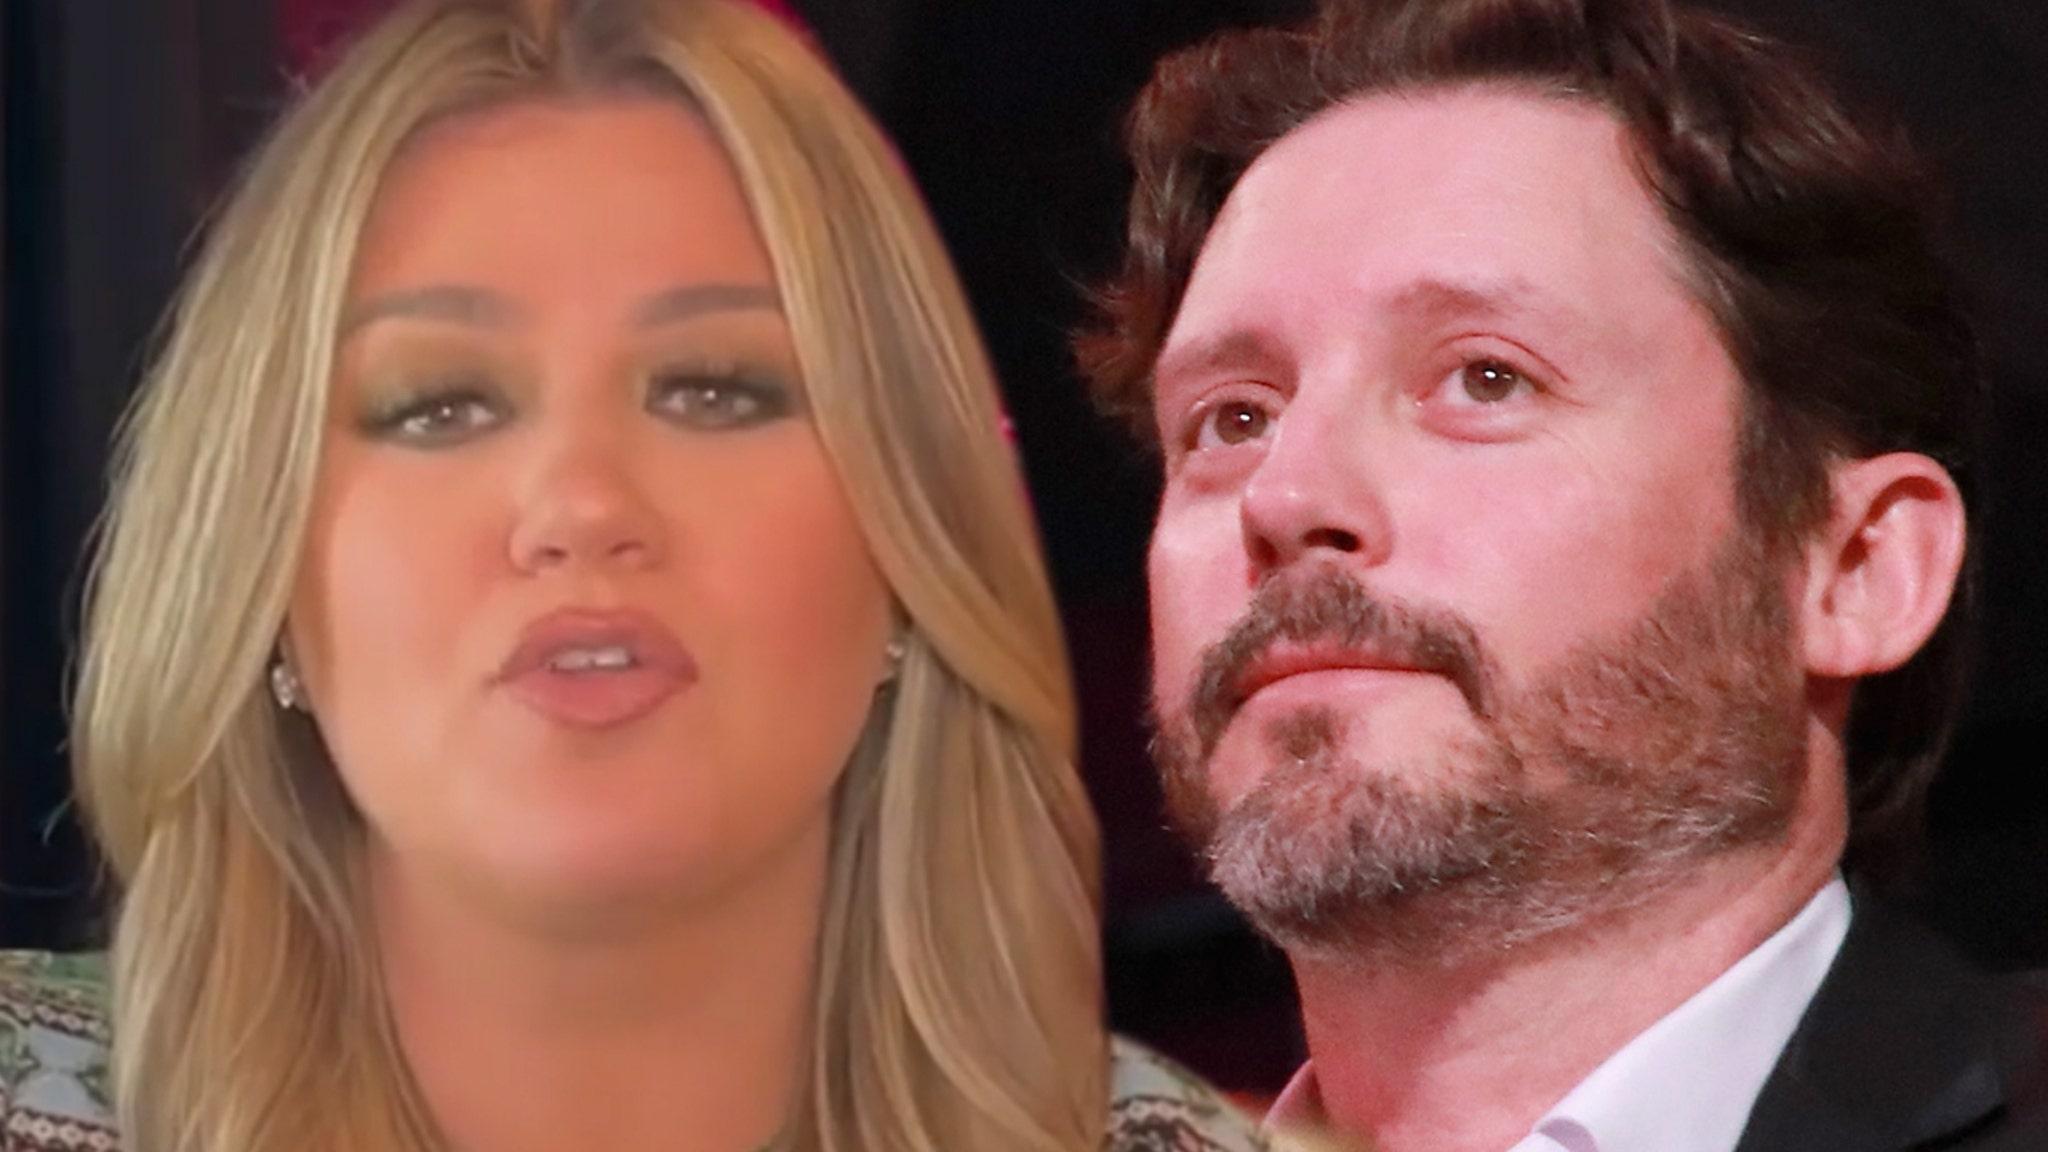 Kelly Clarkson Officially Divorced from Brandon Blackstock - TMZ